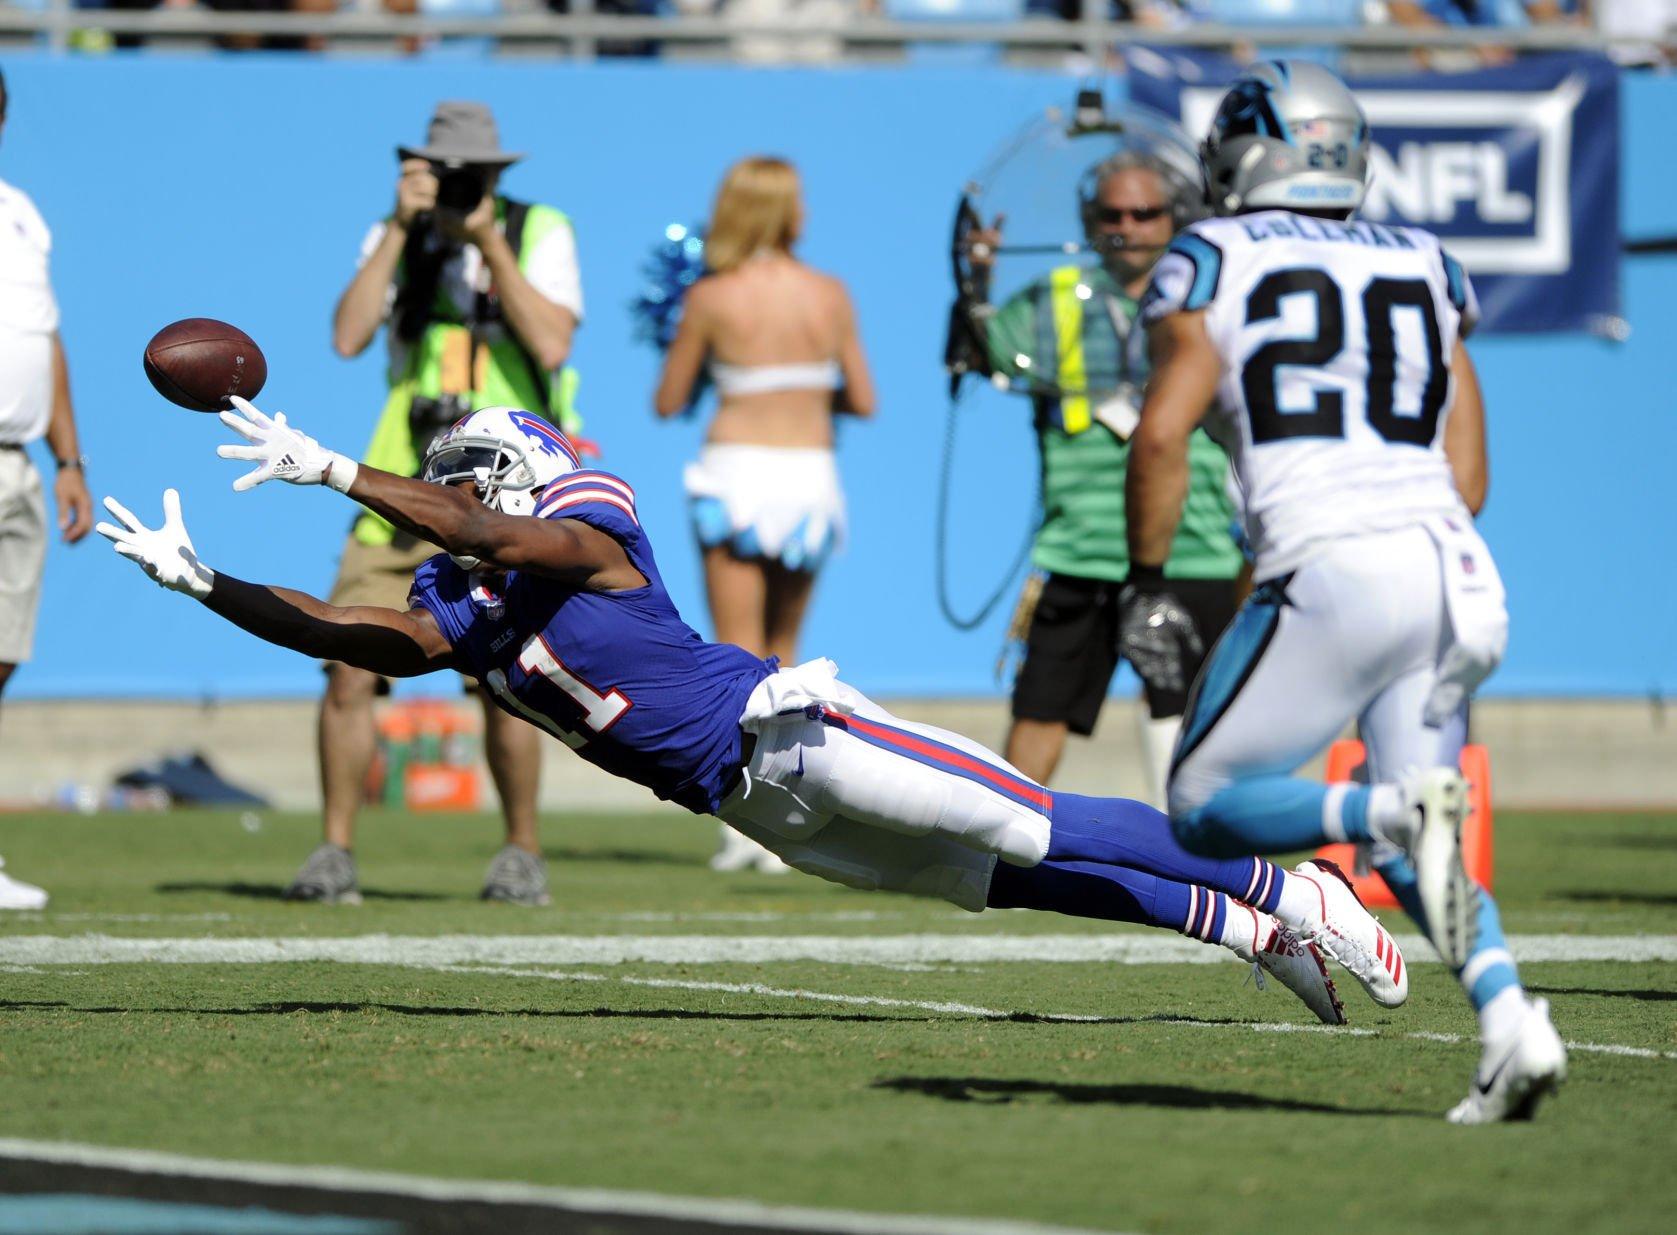 Broncos fall to Bills, 26-16, in Buffalo